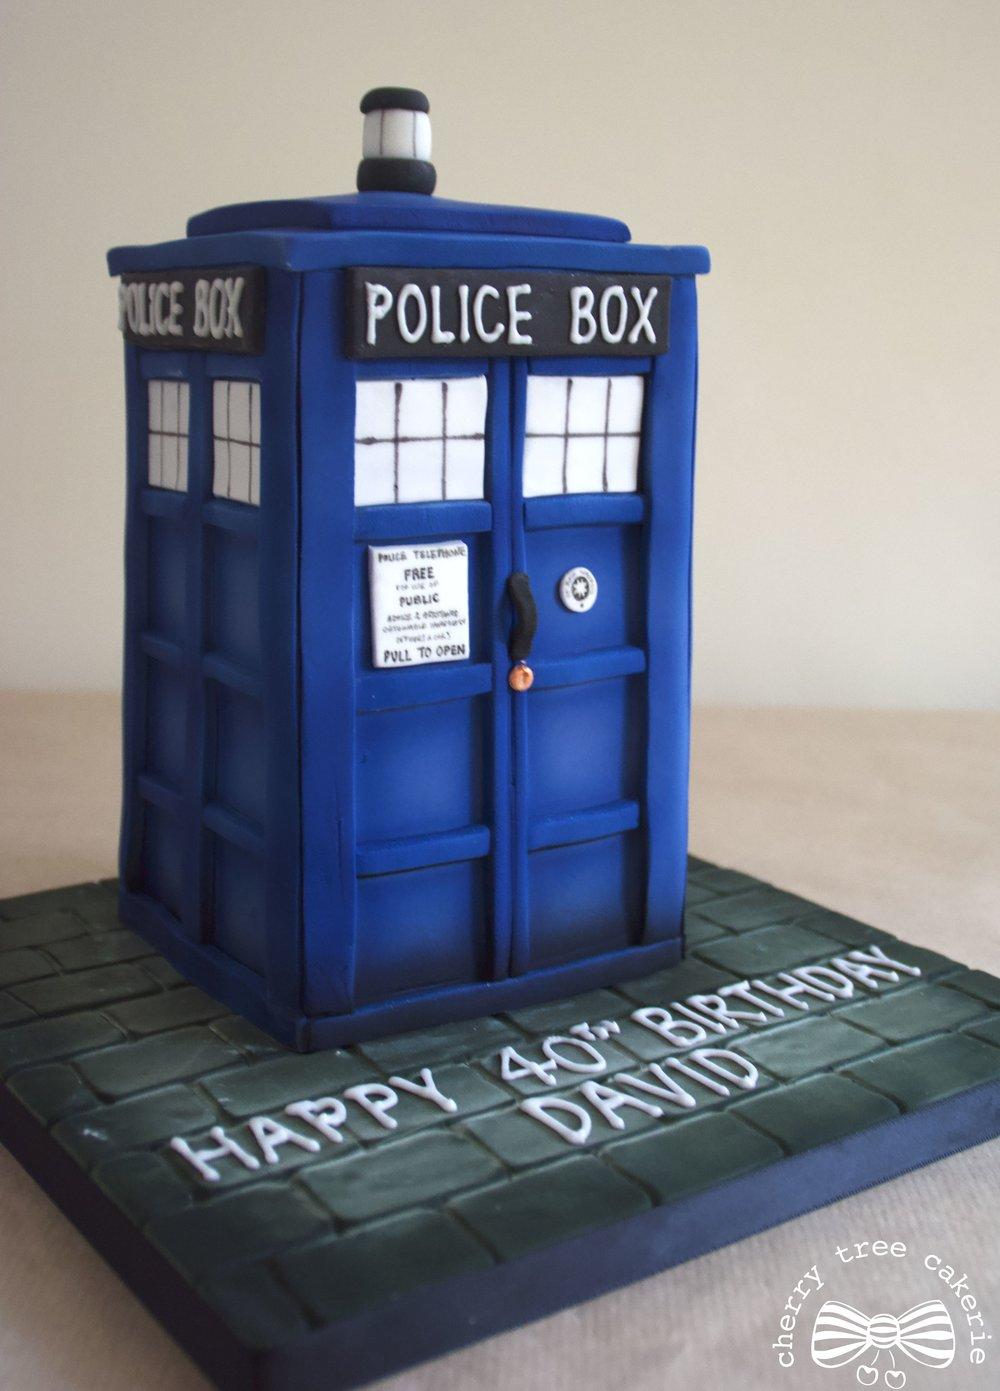 Dr Who Tardis cake - side view.jpg